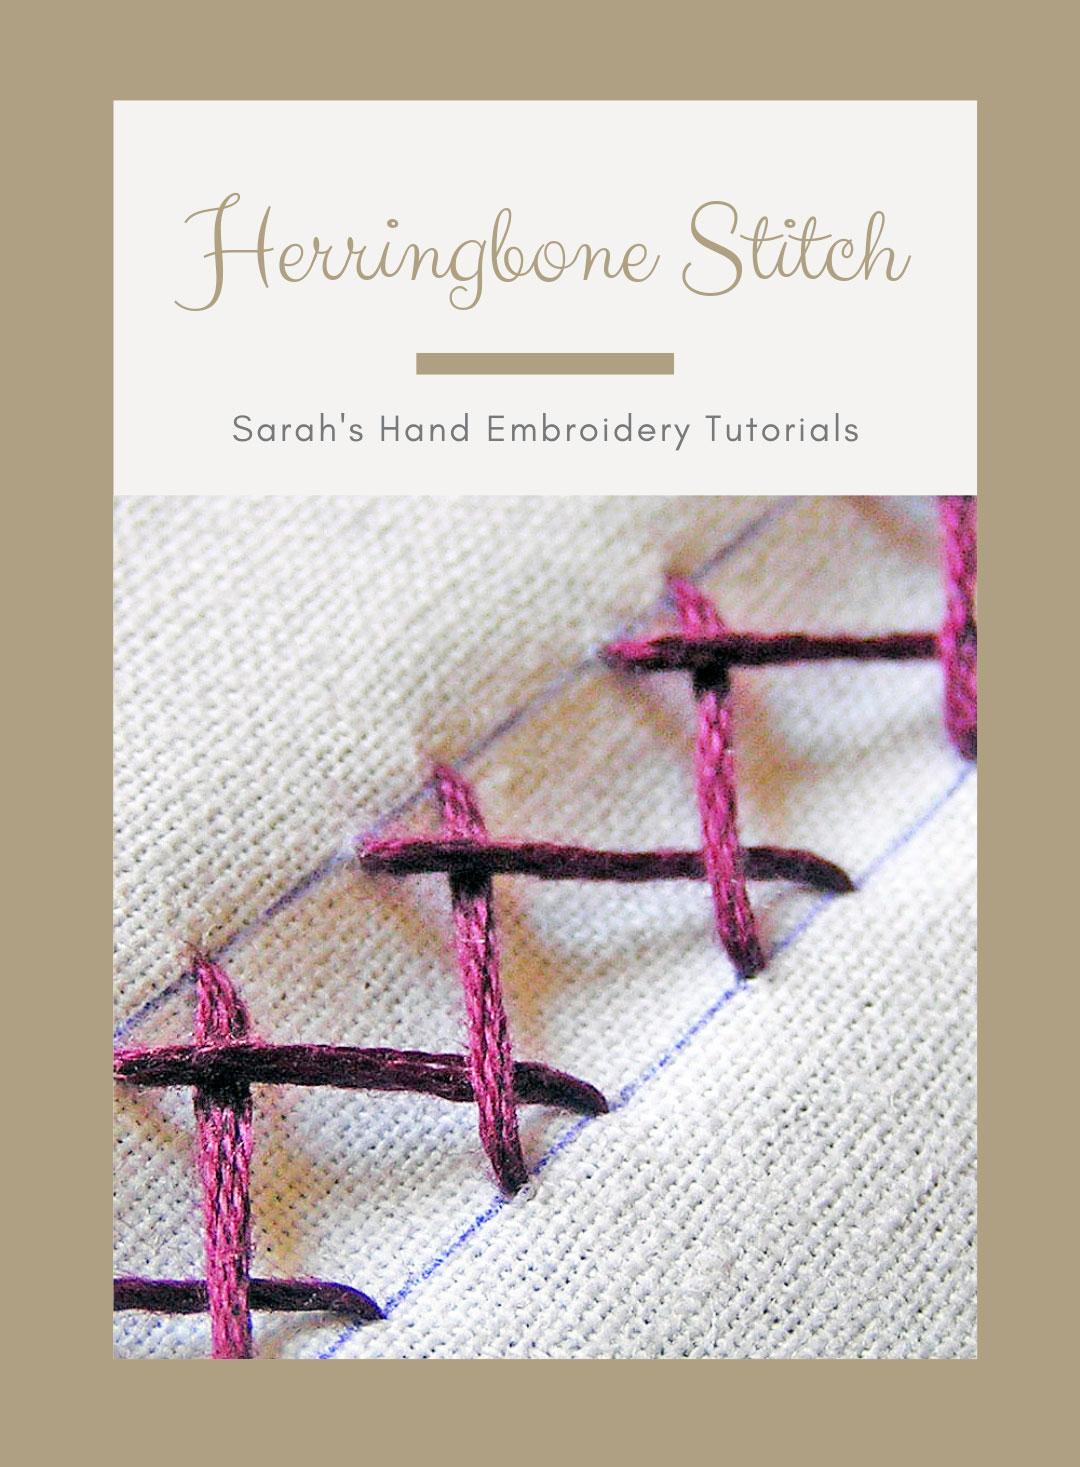 Herringbone Stitch – Sarah's Hand Embroidery Tutorials